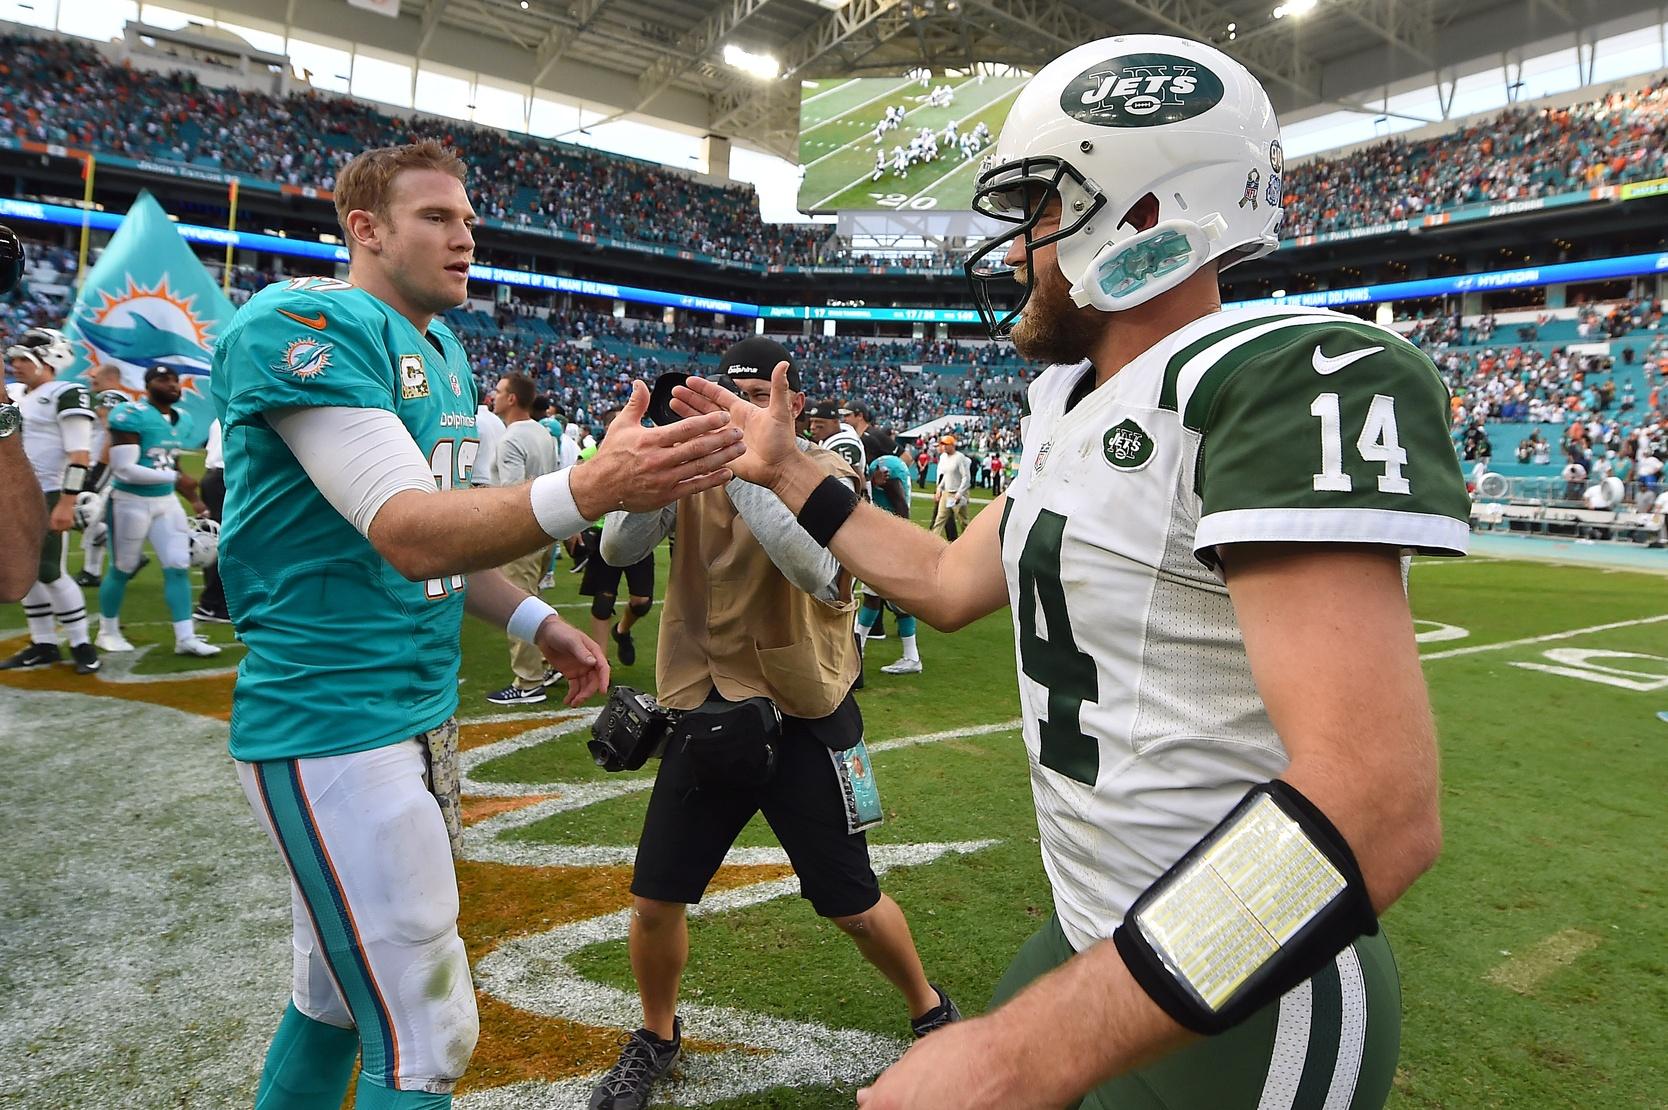 NFL Week 9, Ryan Fitzpatrick, Ryan Tannehill